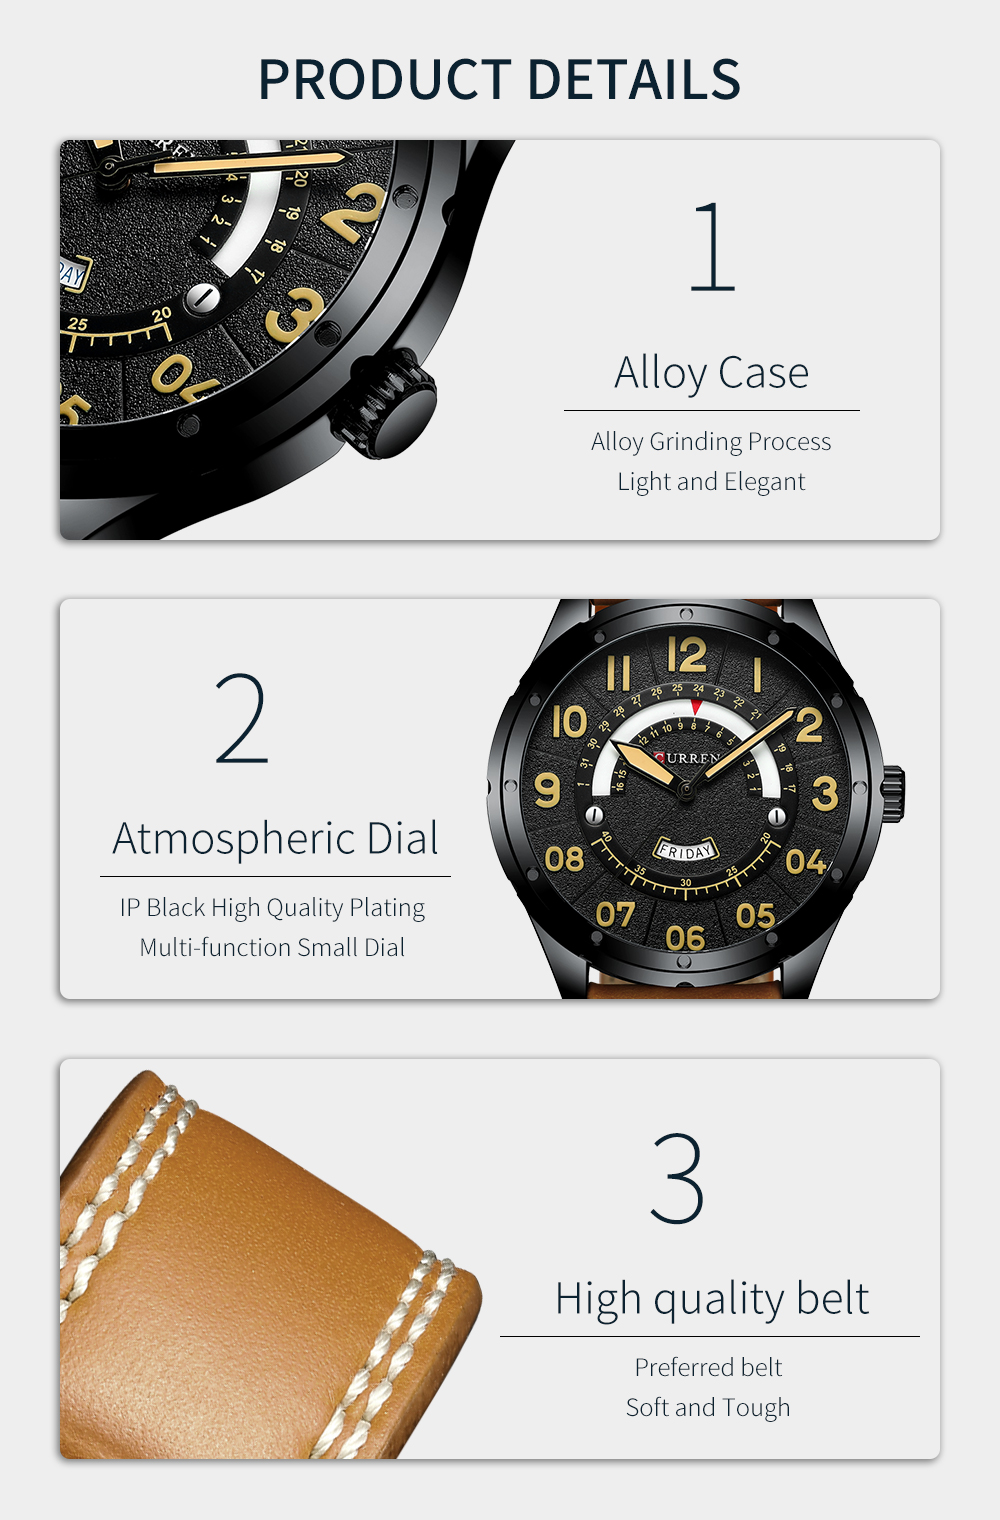 HTB1guNqaqL7gK0jSZFBq6xZZpXa3 CURREN Date Mens Watches Luxury Sport Watch